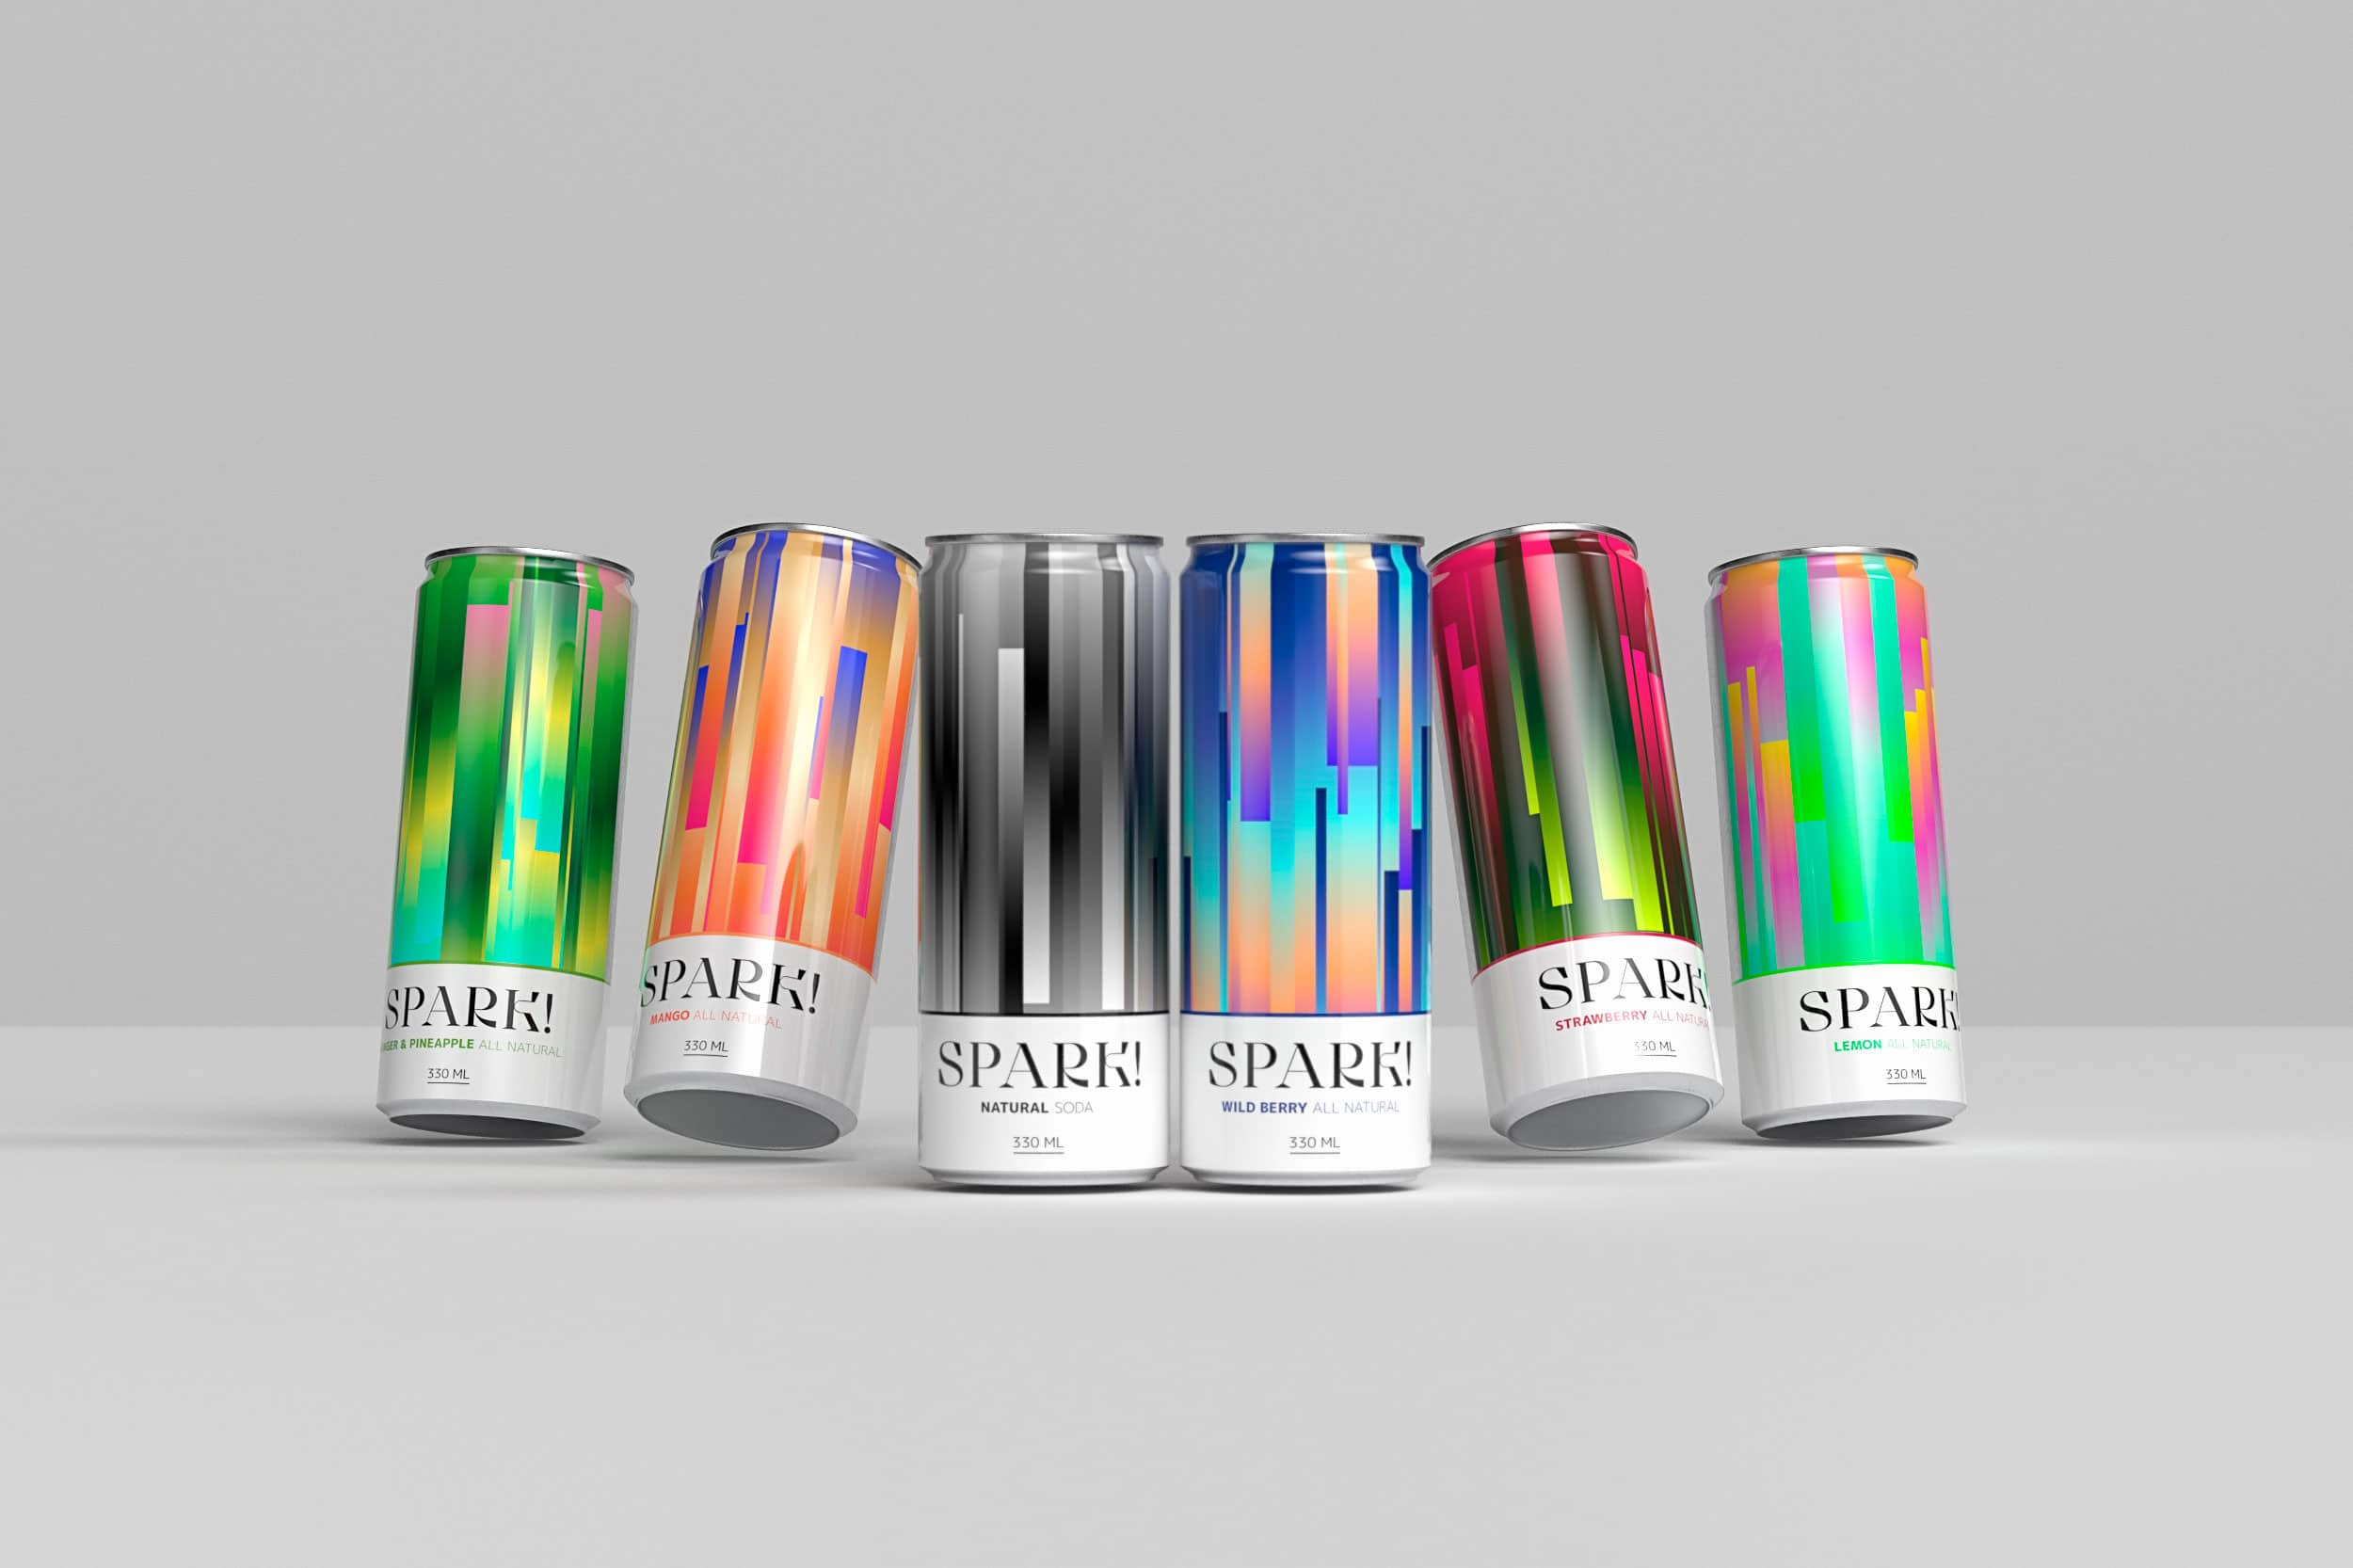 Spark soda prébiotique